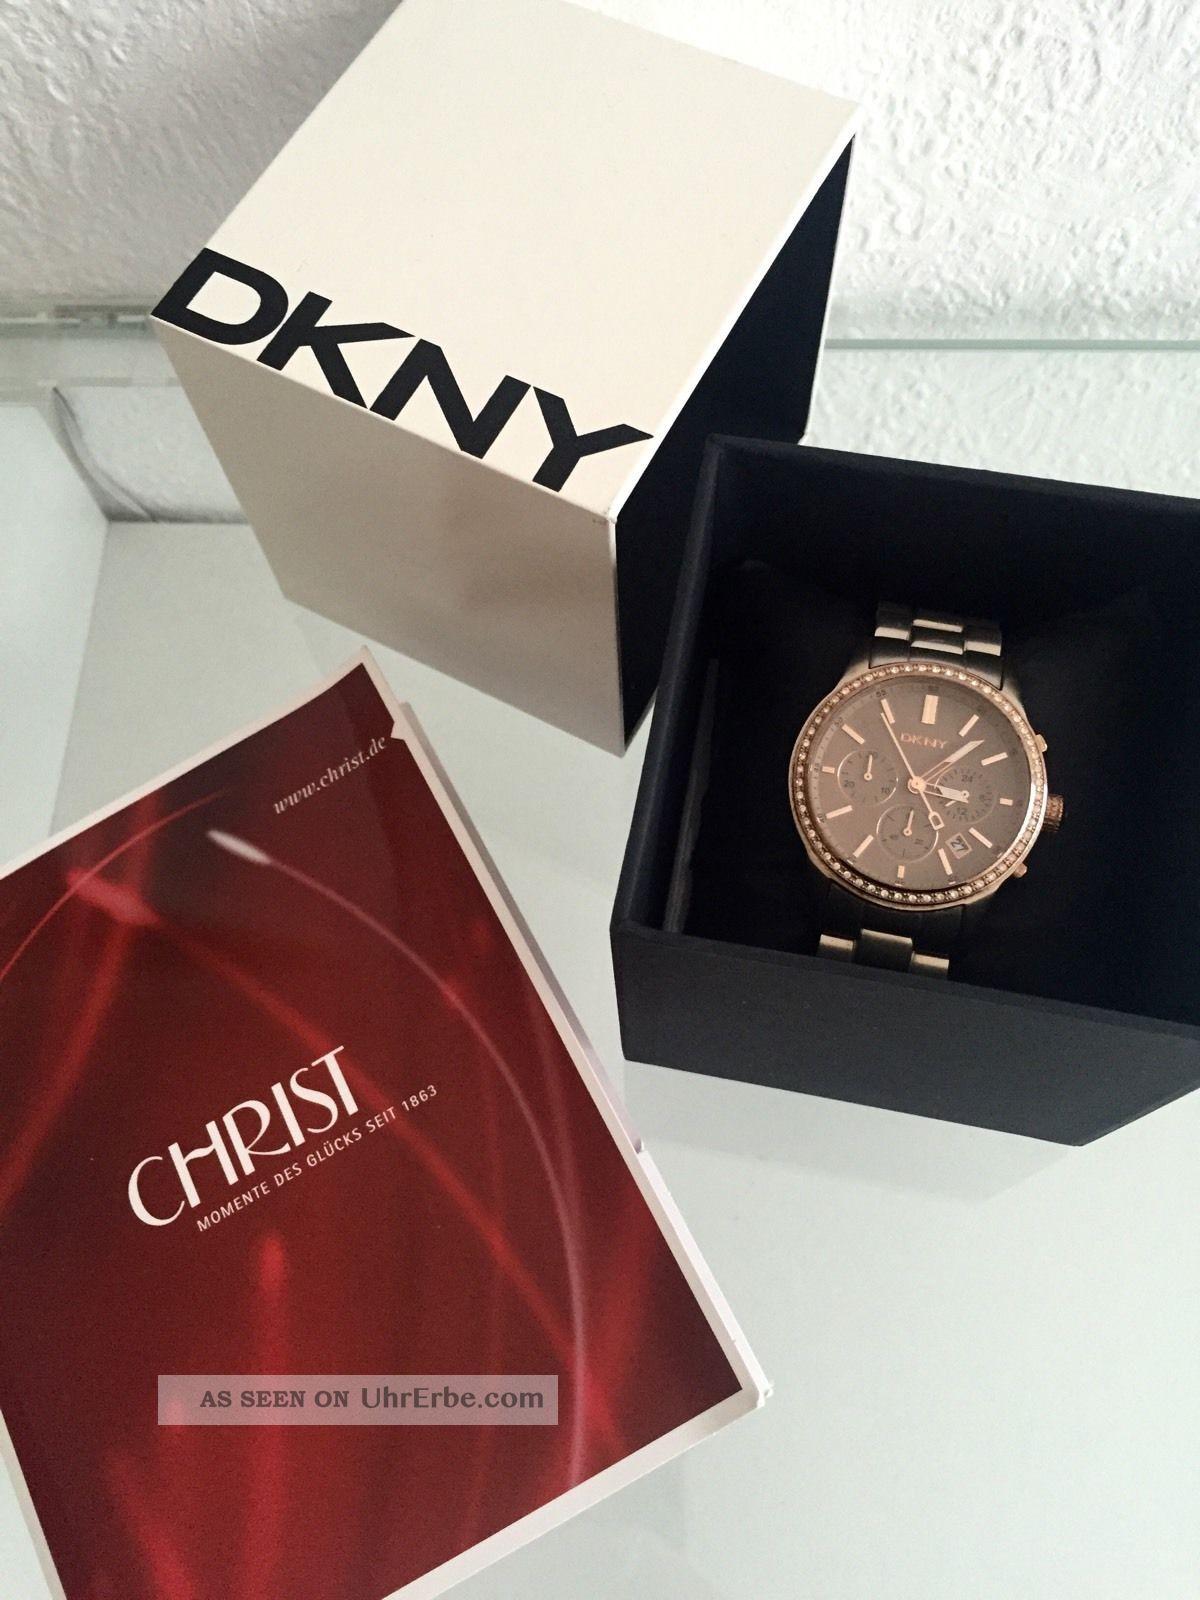 Dkny Damen Uhr Chronograph Ny8324 Braun Zirkonia Armbanduhren Bild